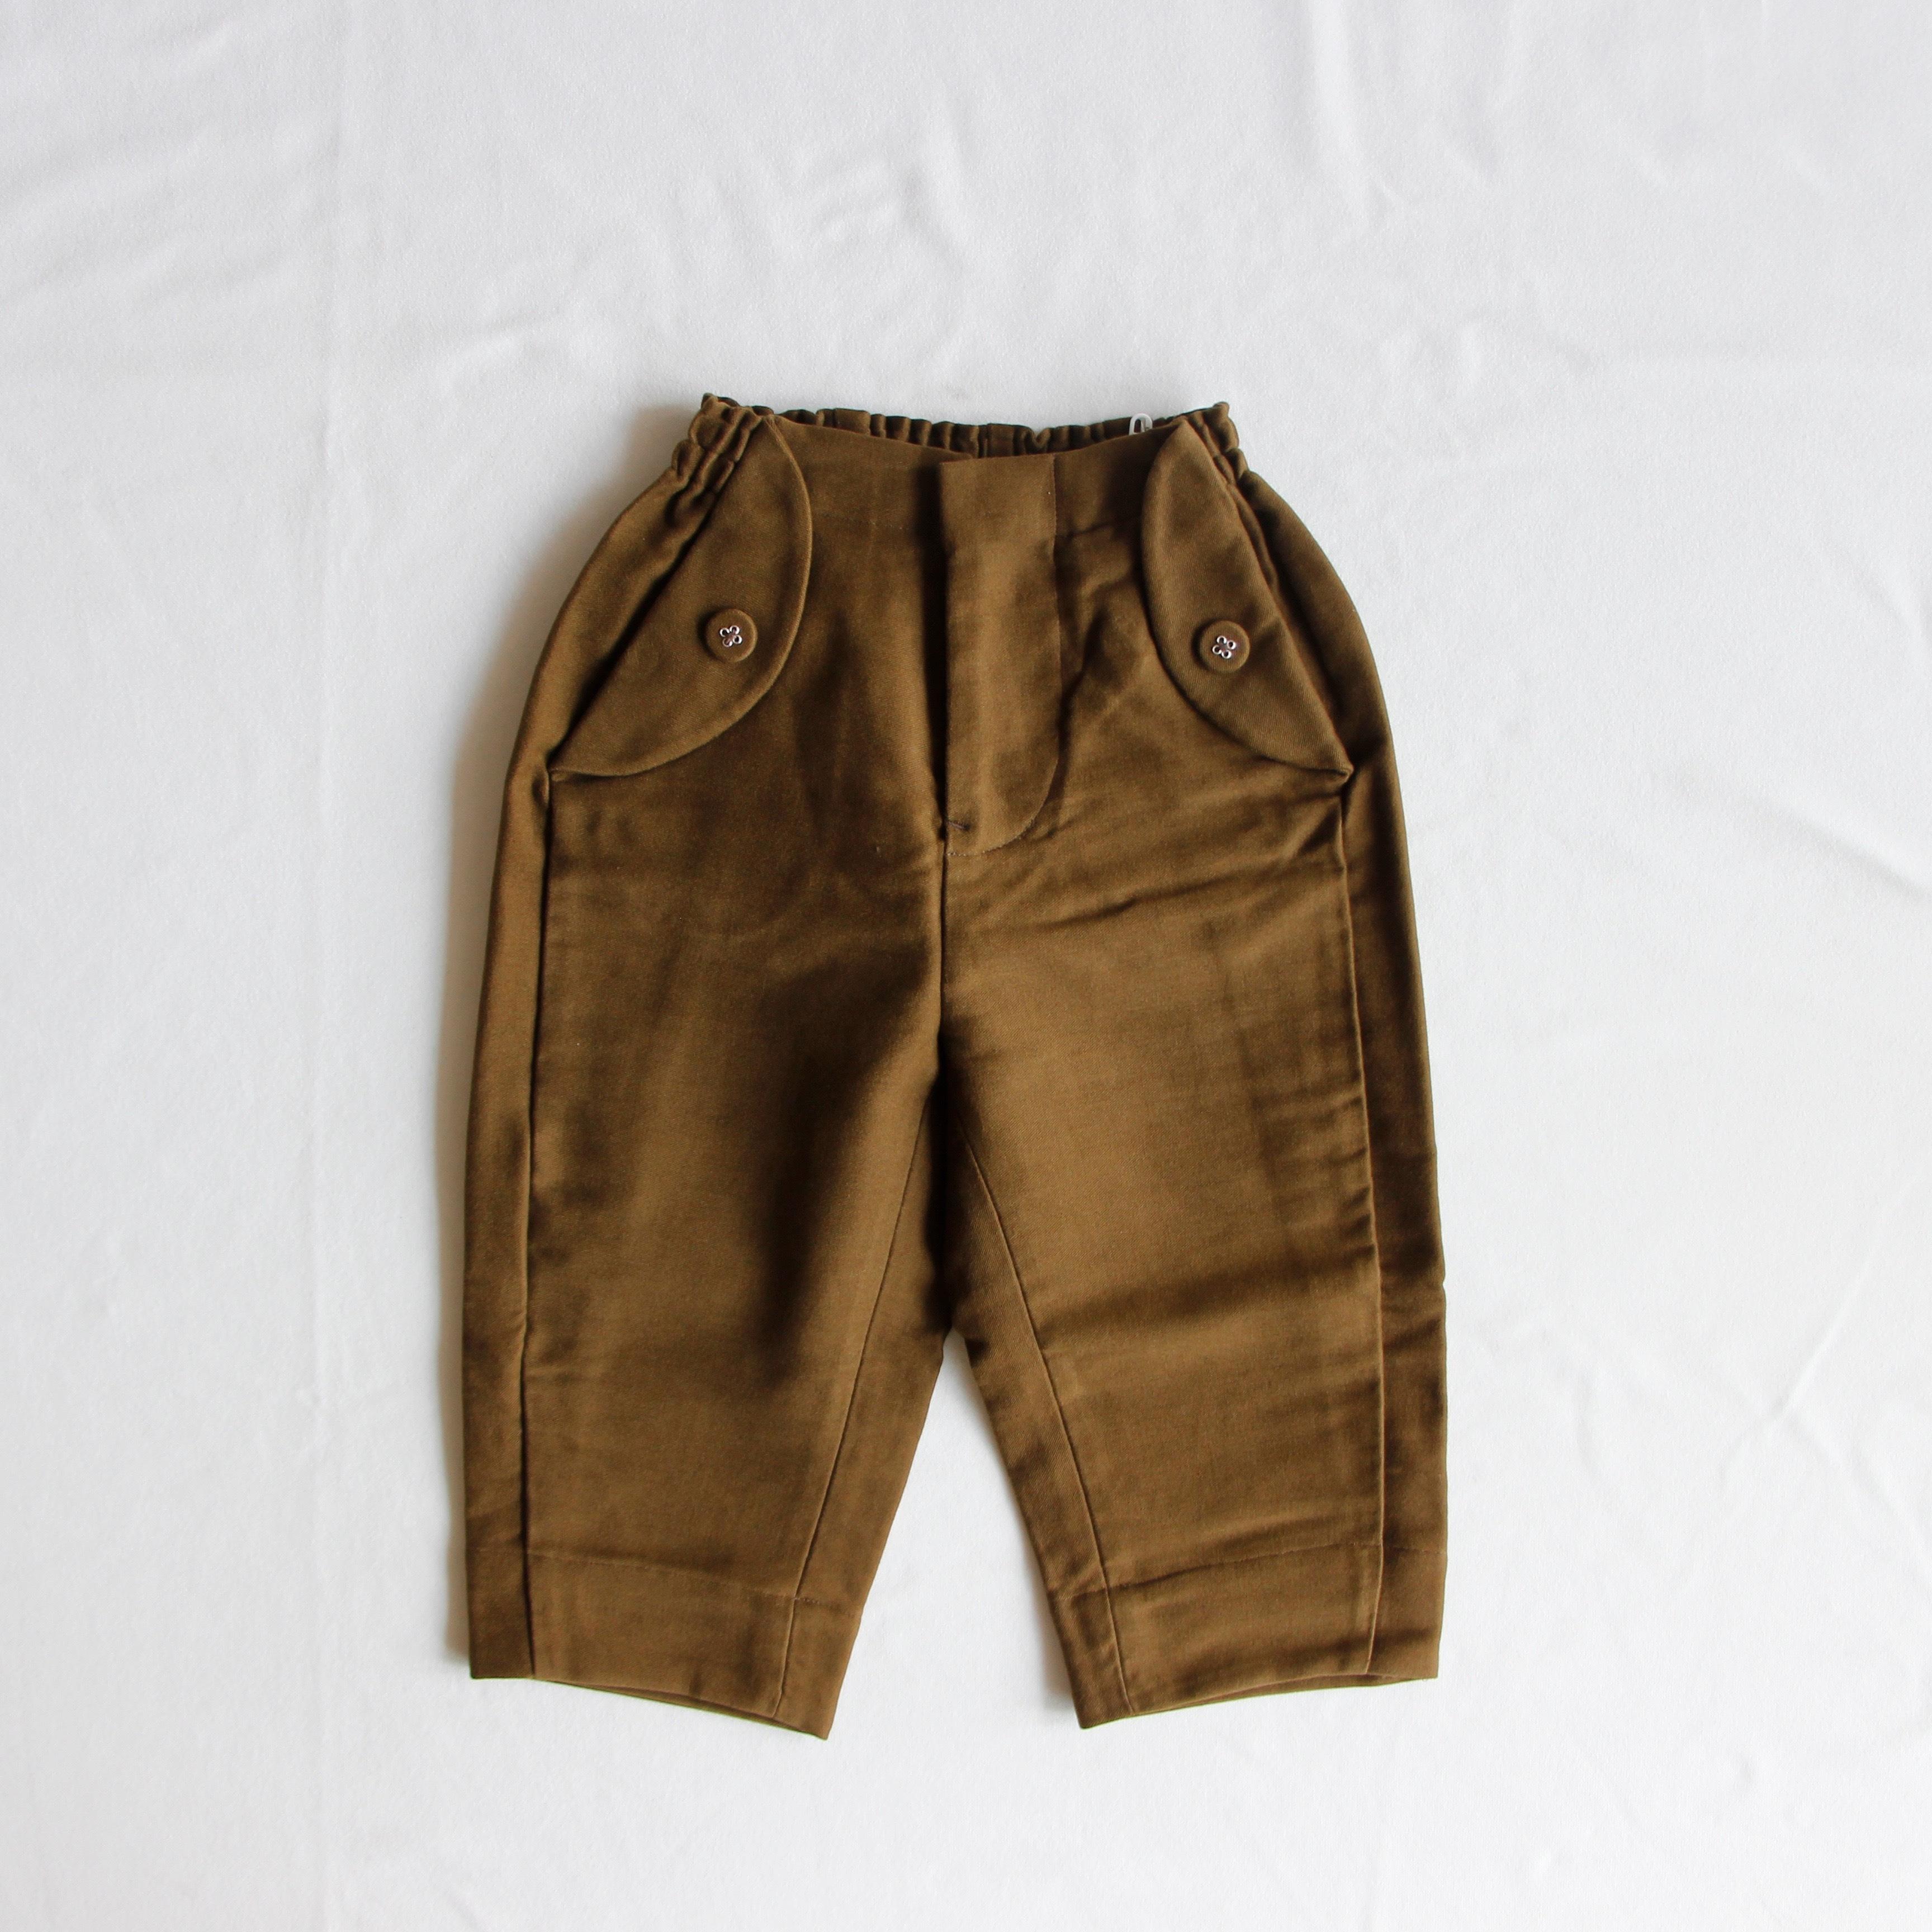 《mina perhonen 2019AW》bonbon パンツ / khaki / 90・100cm